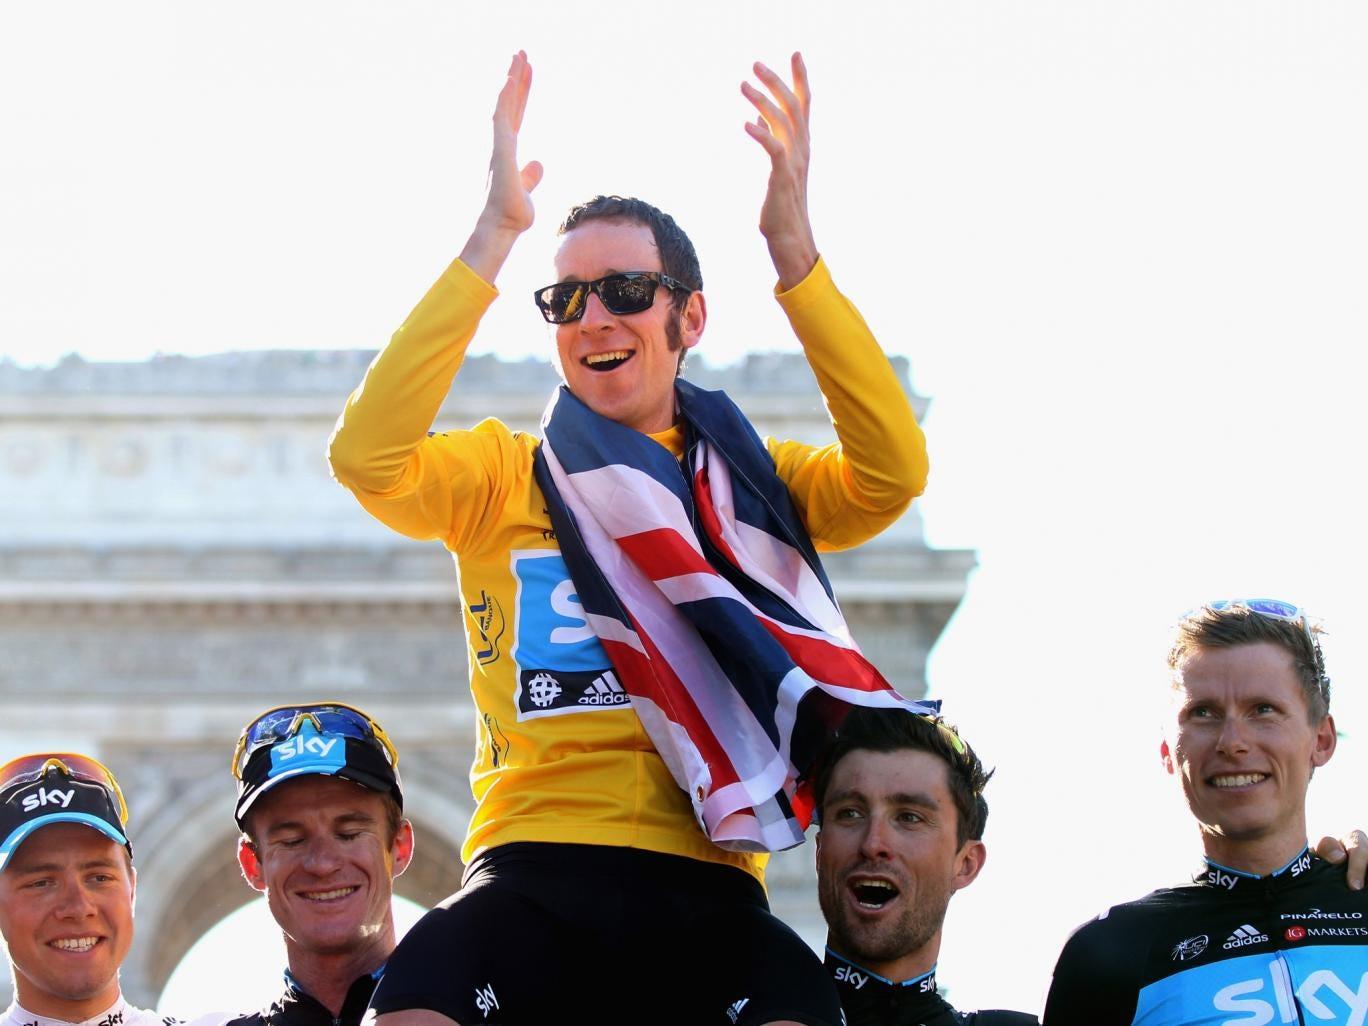 Bradley Wiggins pictured celebrating his Tour de France success in 2012